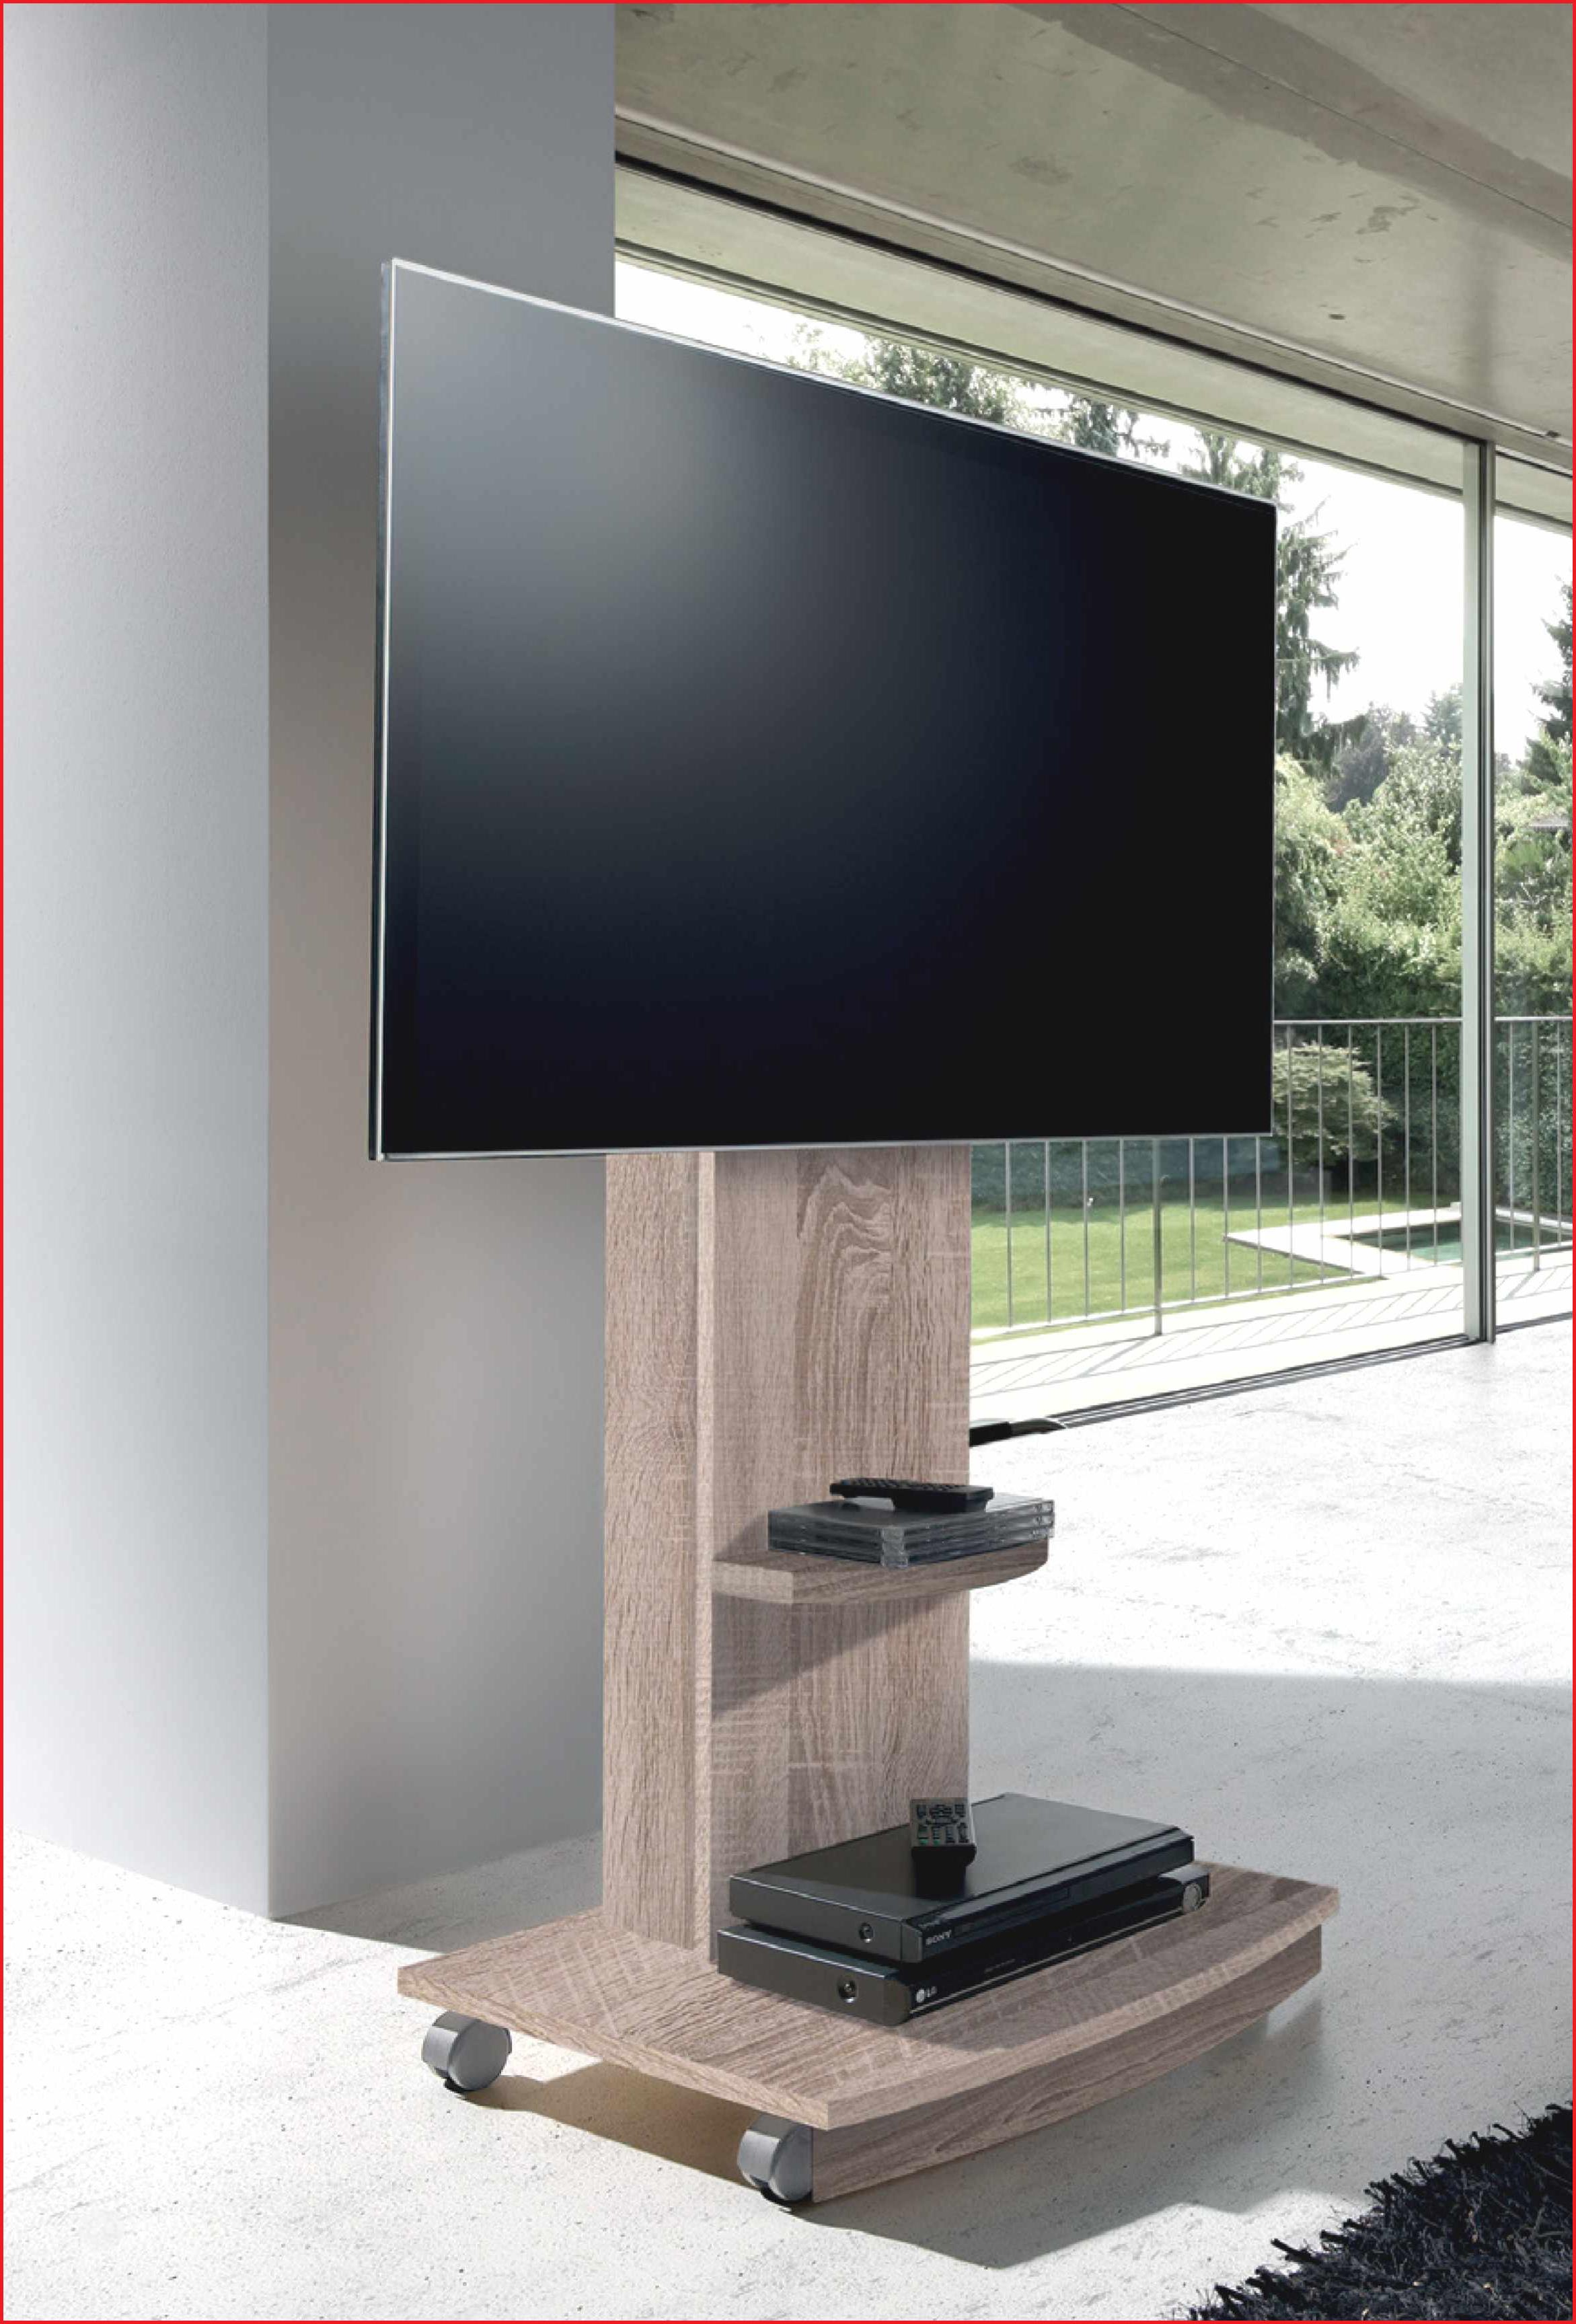 Mesas De Television Ikea J7do Mesas De Television Baratas Muebles Tv Modernos Ikea Muebles